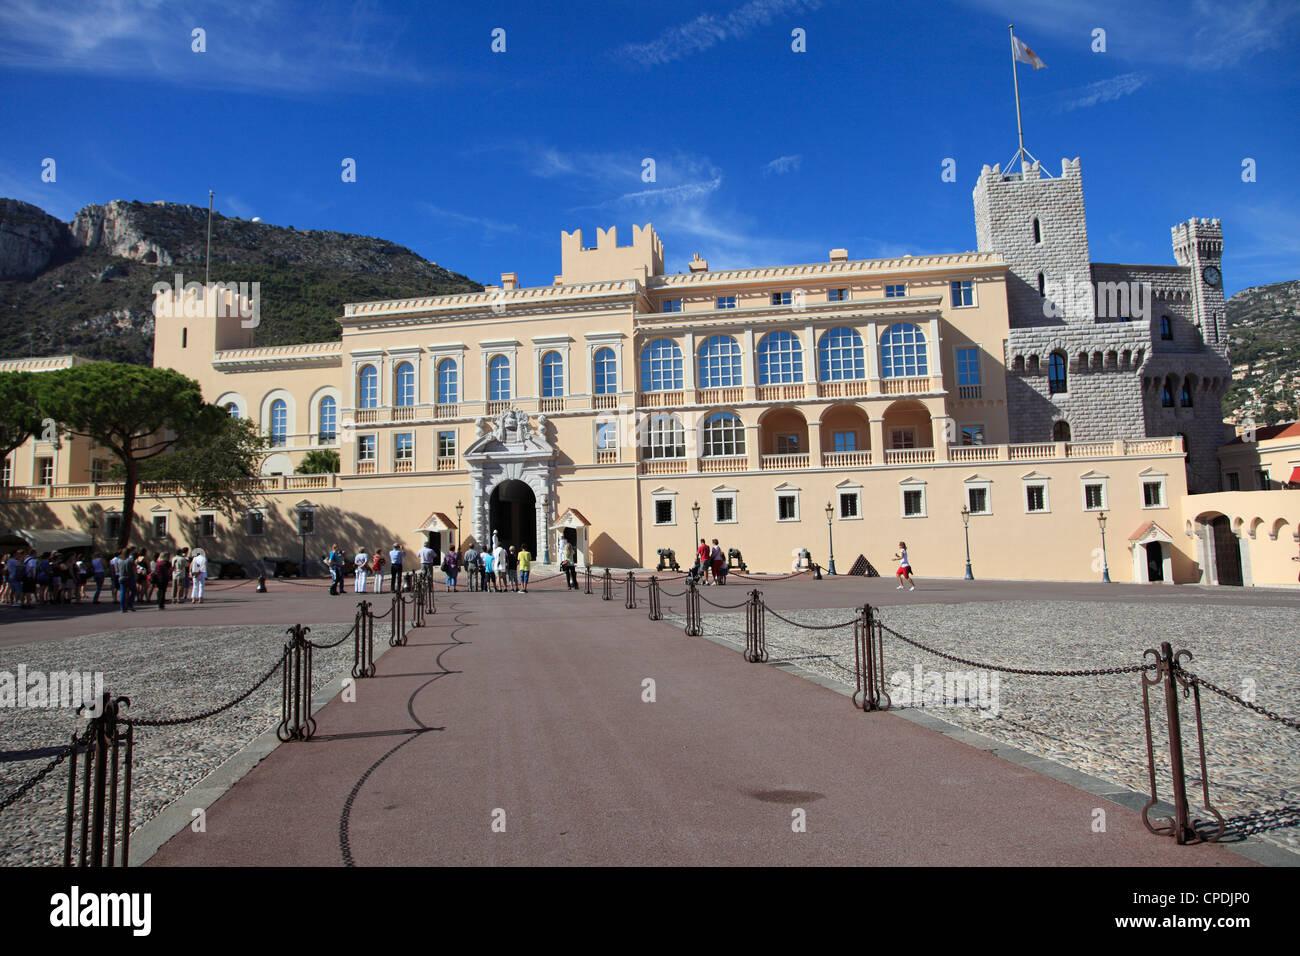 Princes of Grimaldi Palace, Royal Palace, Monaco, Cote d'Azur, Mediterranean, Europe - Stock Image